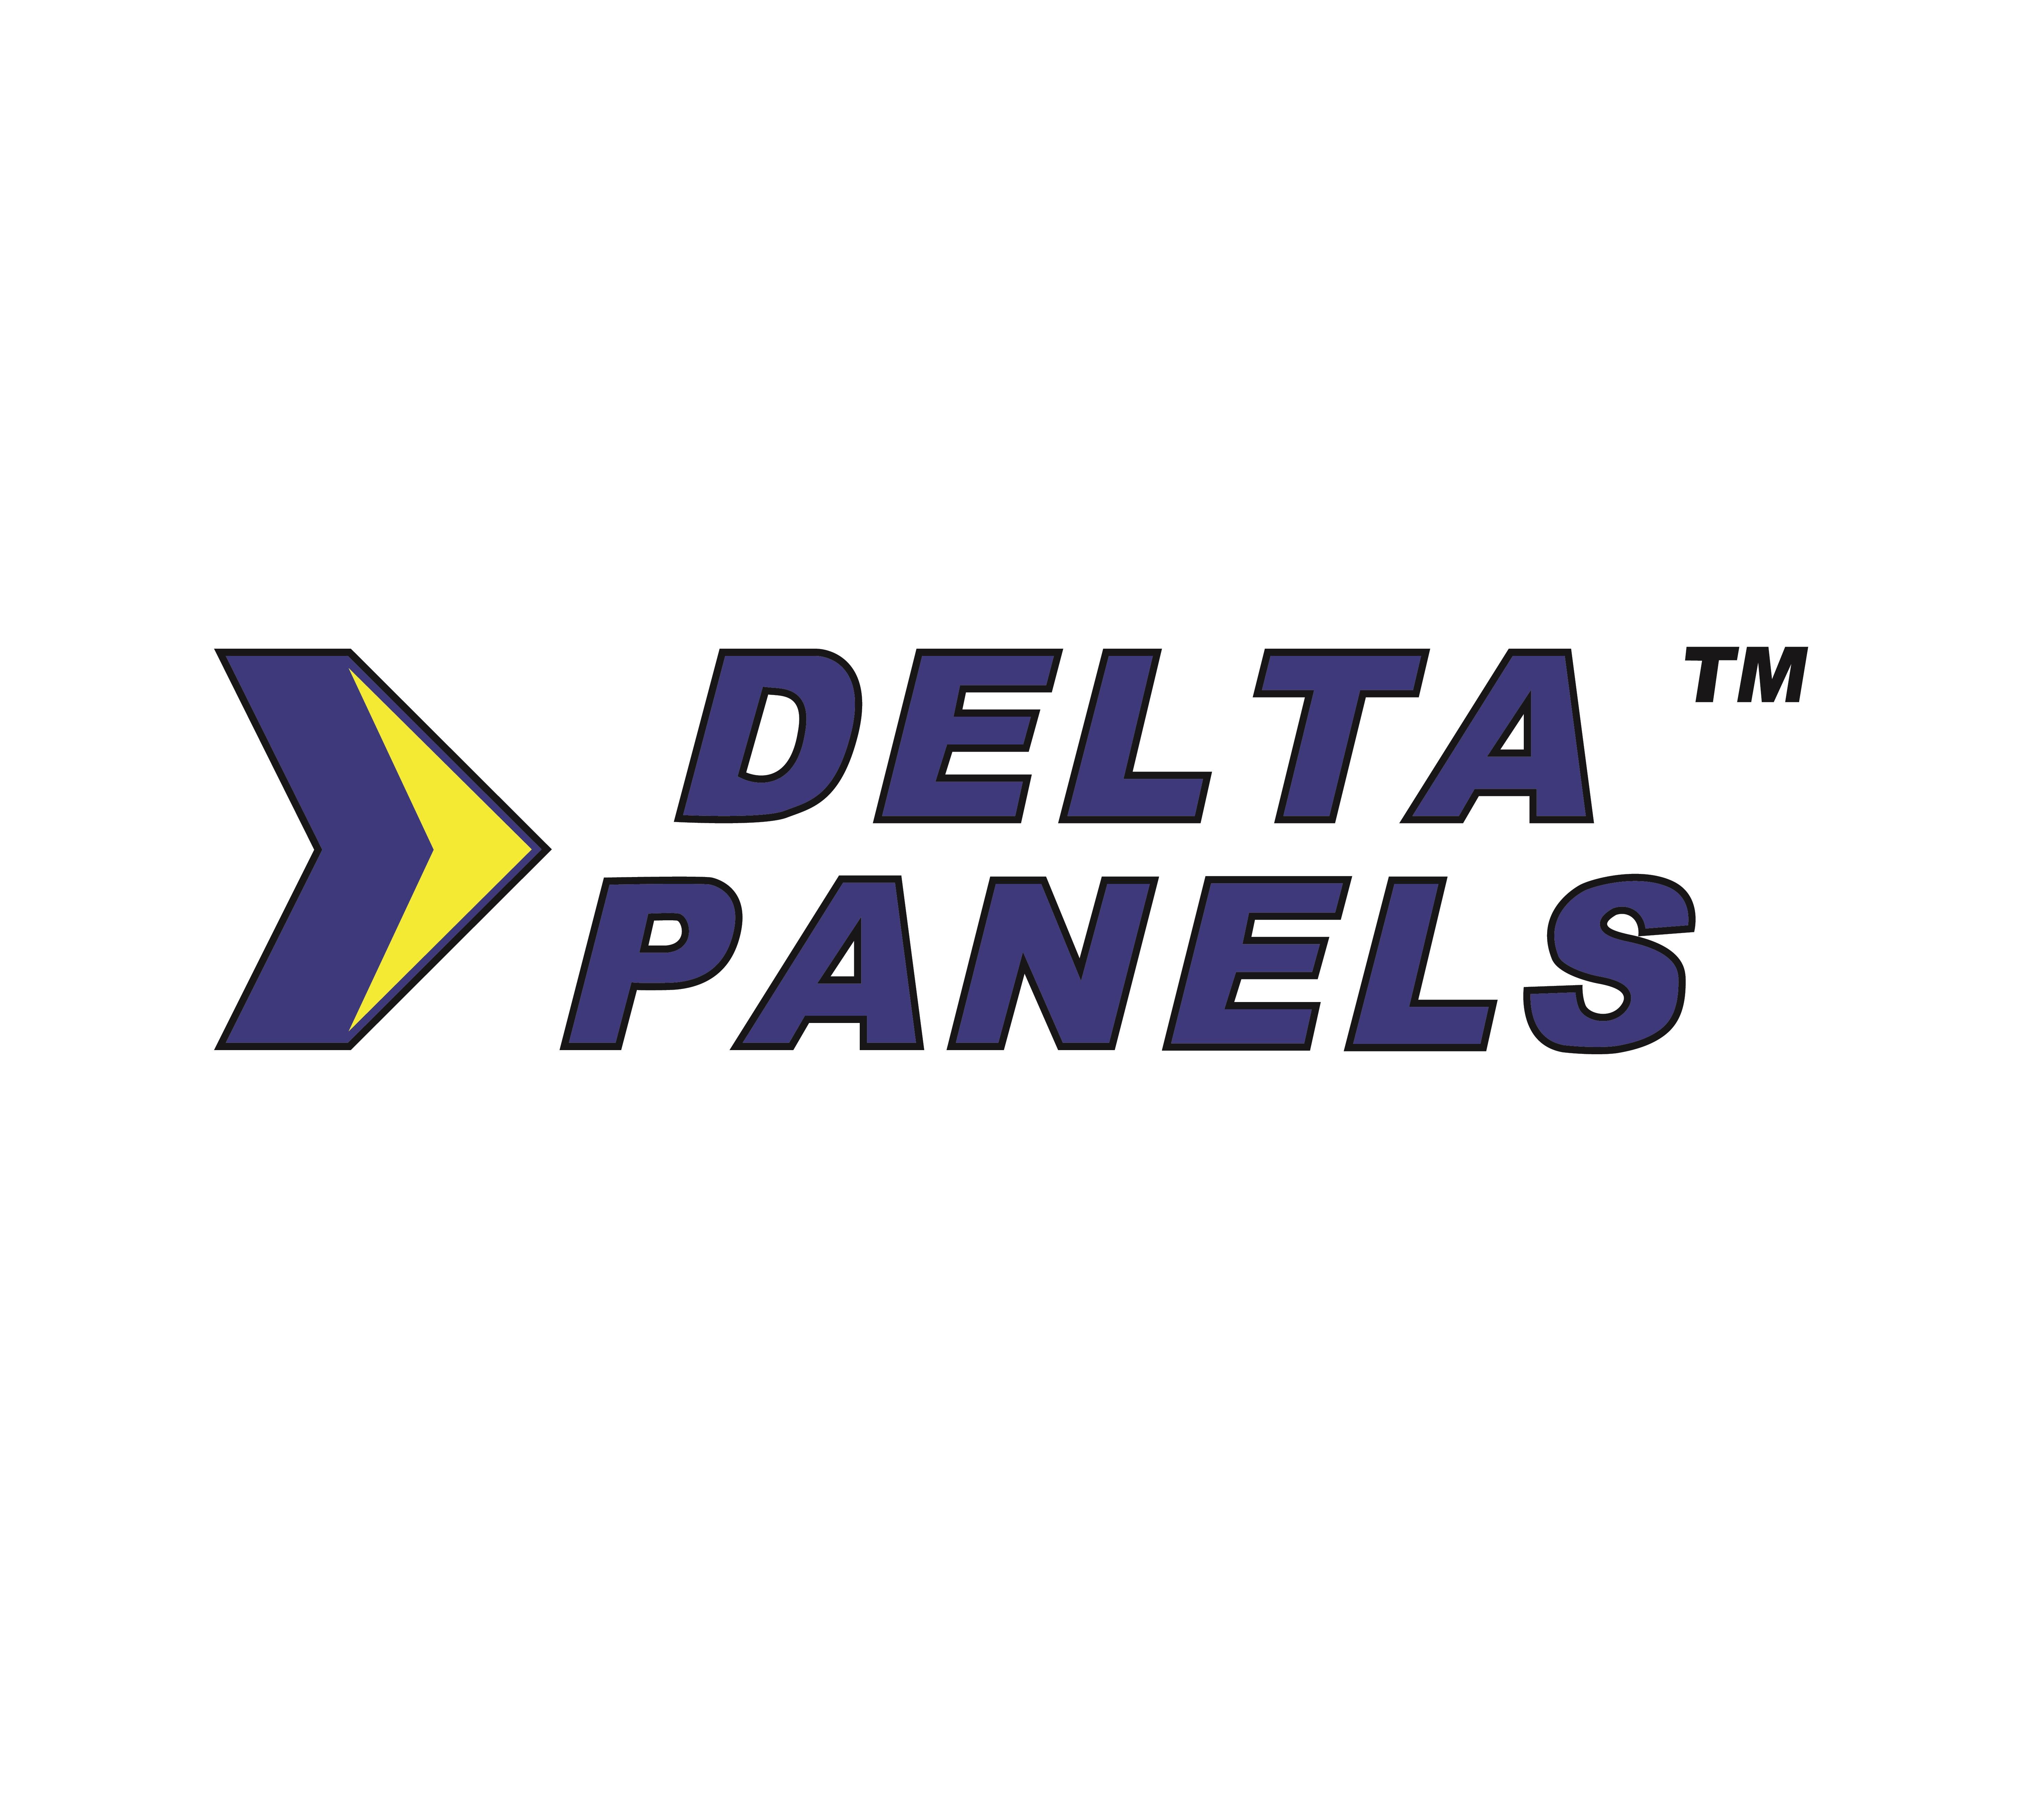 Delta Panels logo